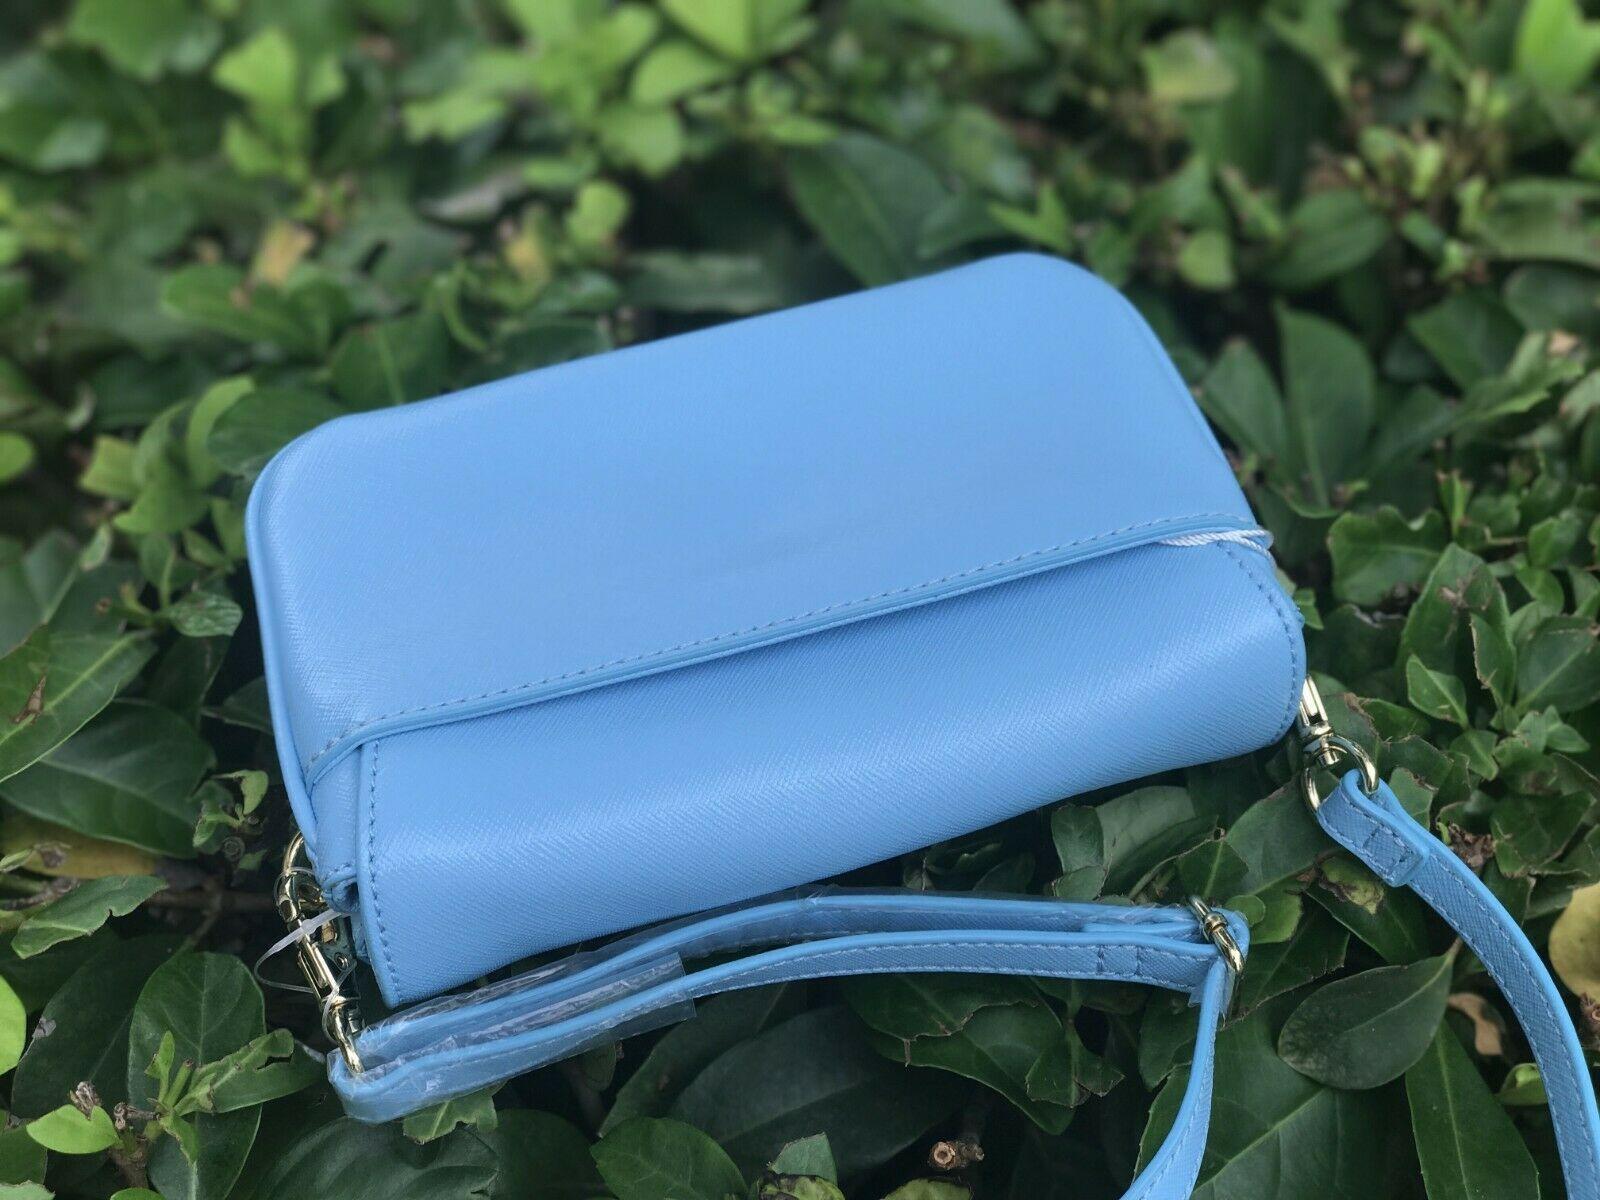 Tory Burch Robinson Cross Body Bag Morning Sky Light Blue Small Handbag